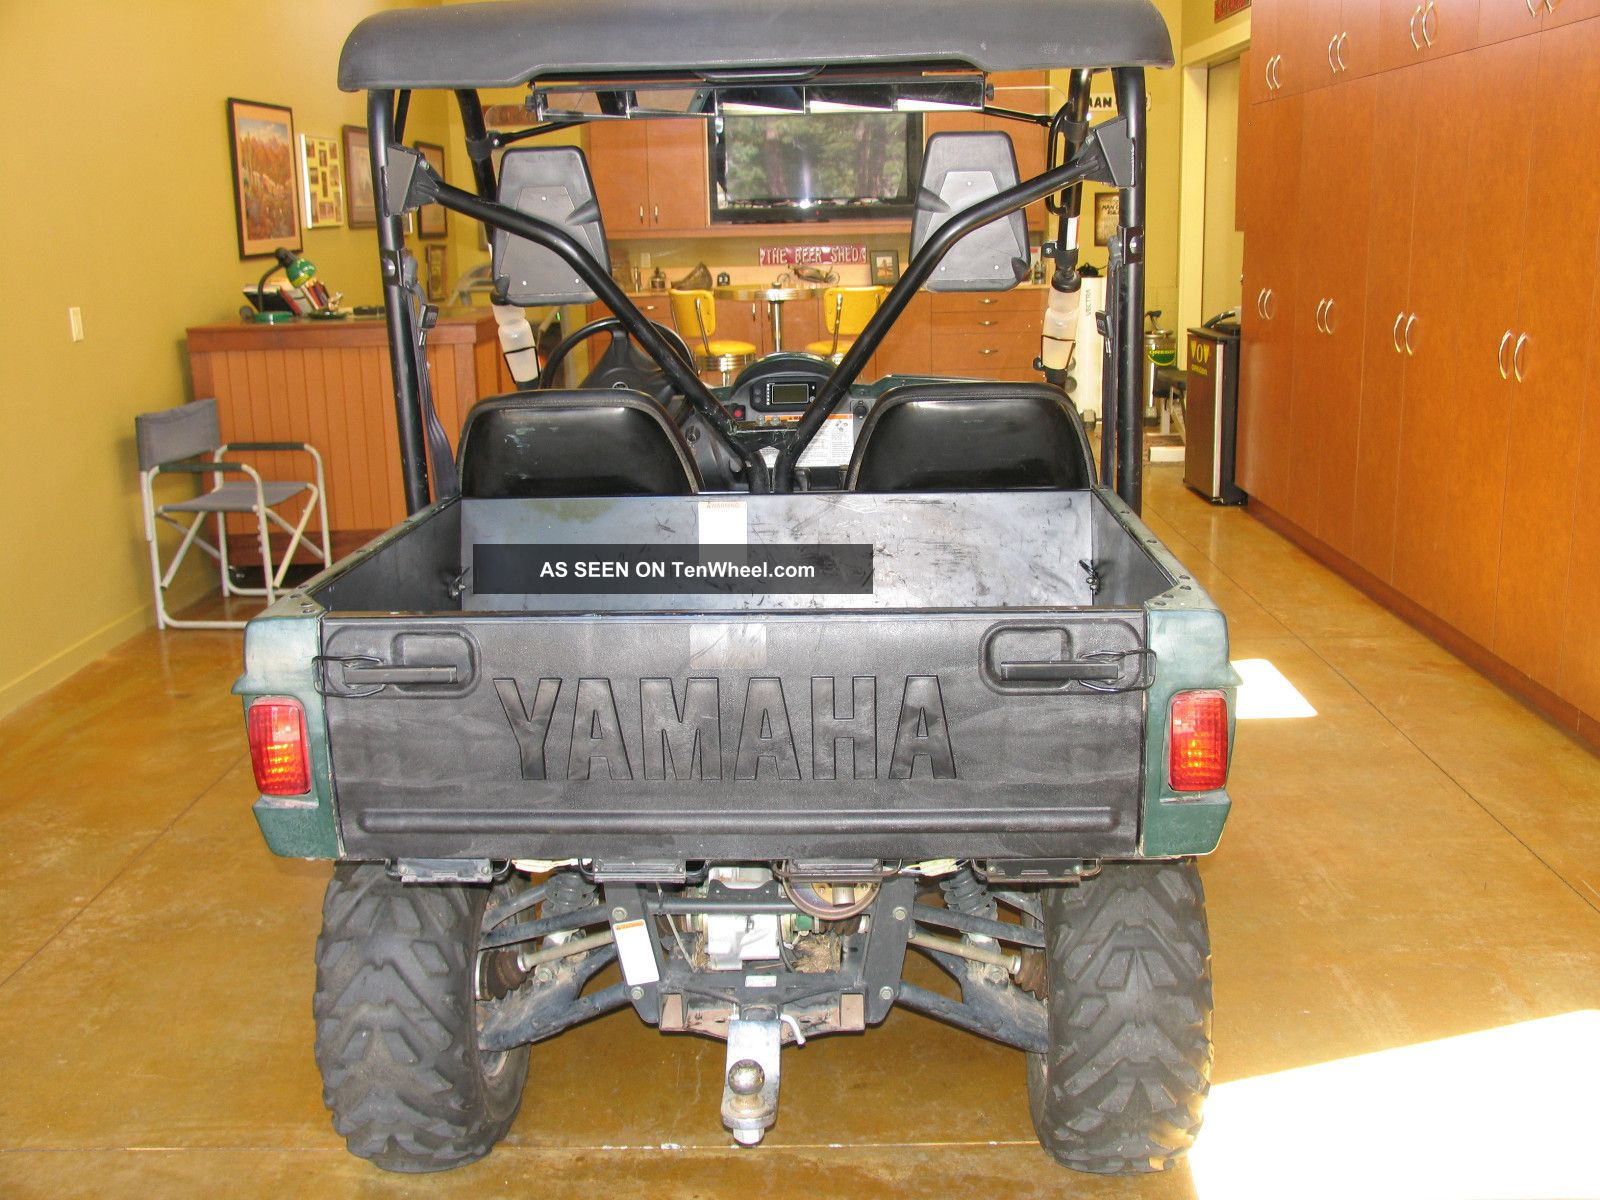 Yamaha Rhino 450 Specs 2006 Rear Brake Diagram On Piston Caliper 1600x1200